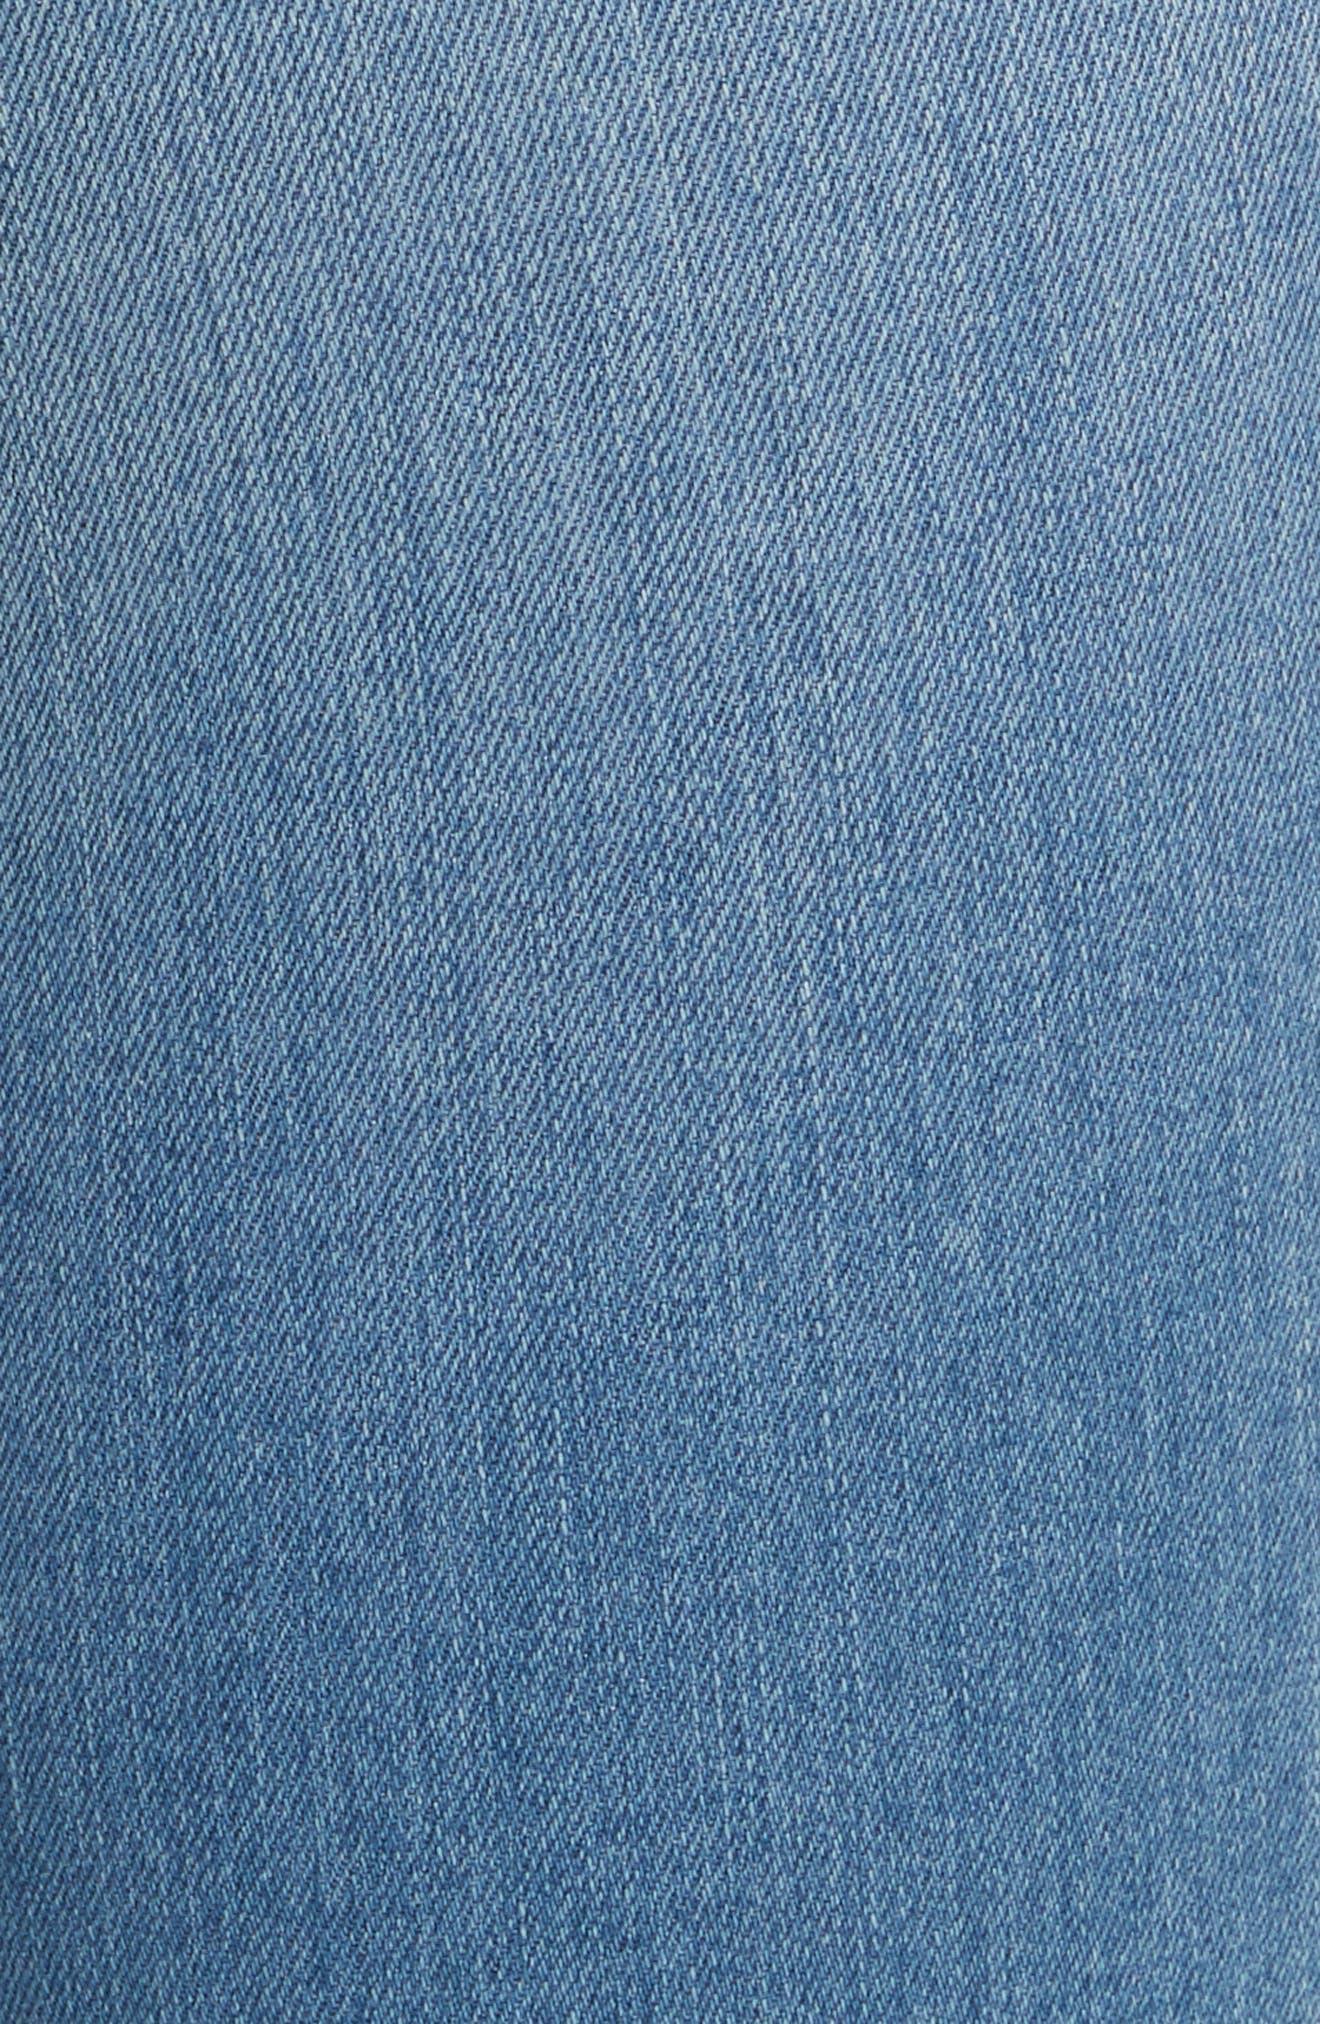 Debbie High Waist Fray Hem Jeans,                             Alternate thumbnail 5, color,